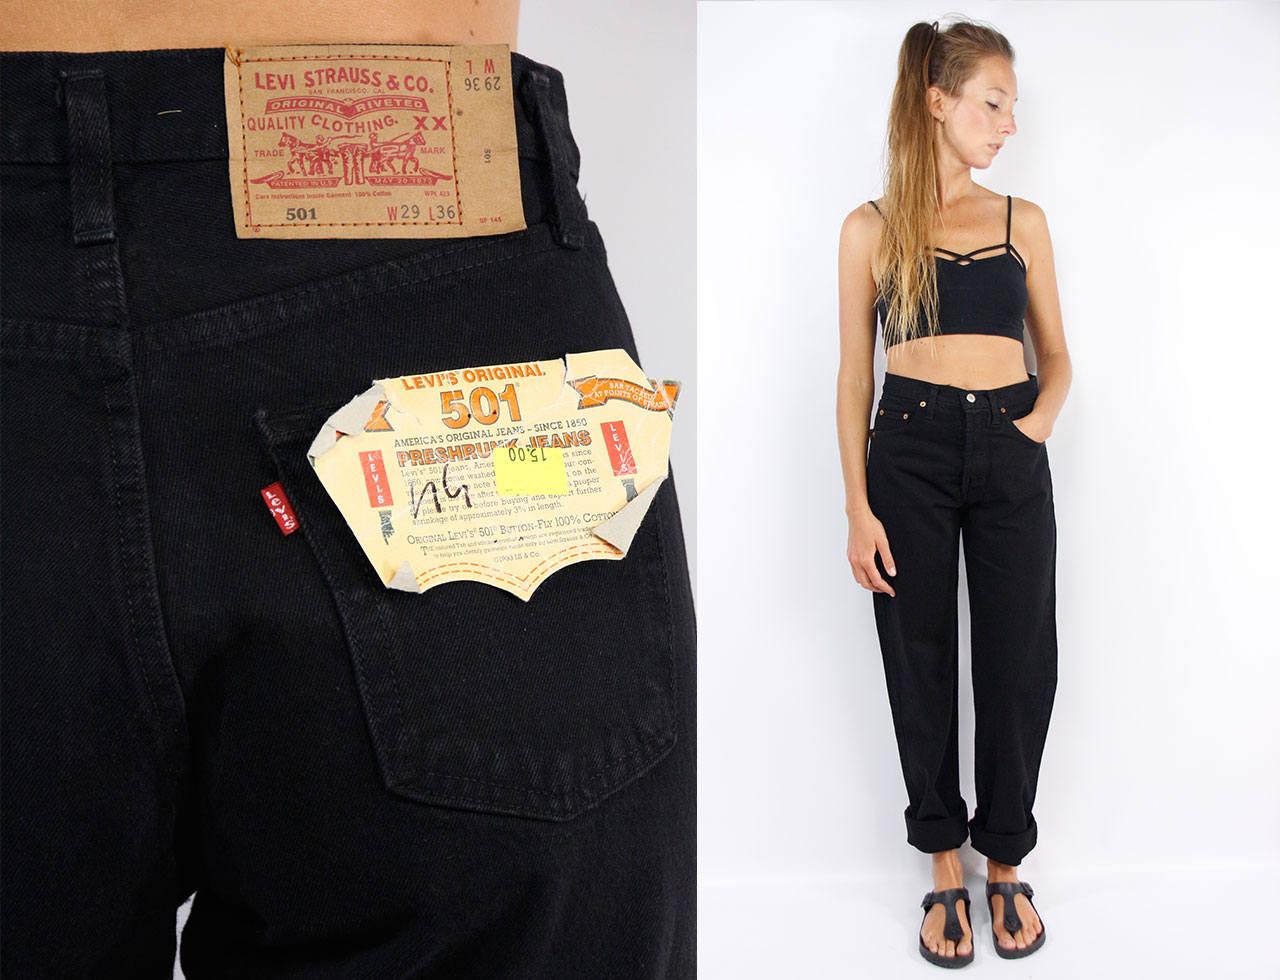 Levis 501 Black Levis 501 29 Levis Jeans 29 Levis Jeans Women